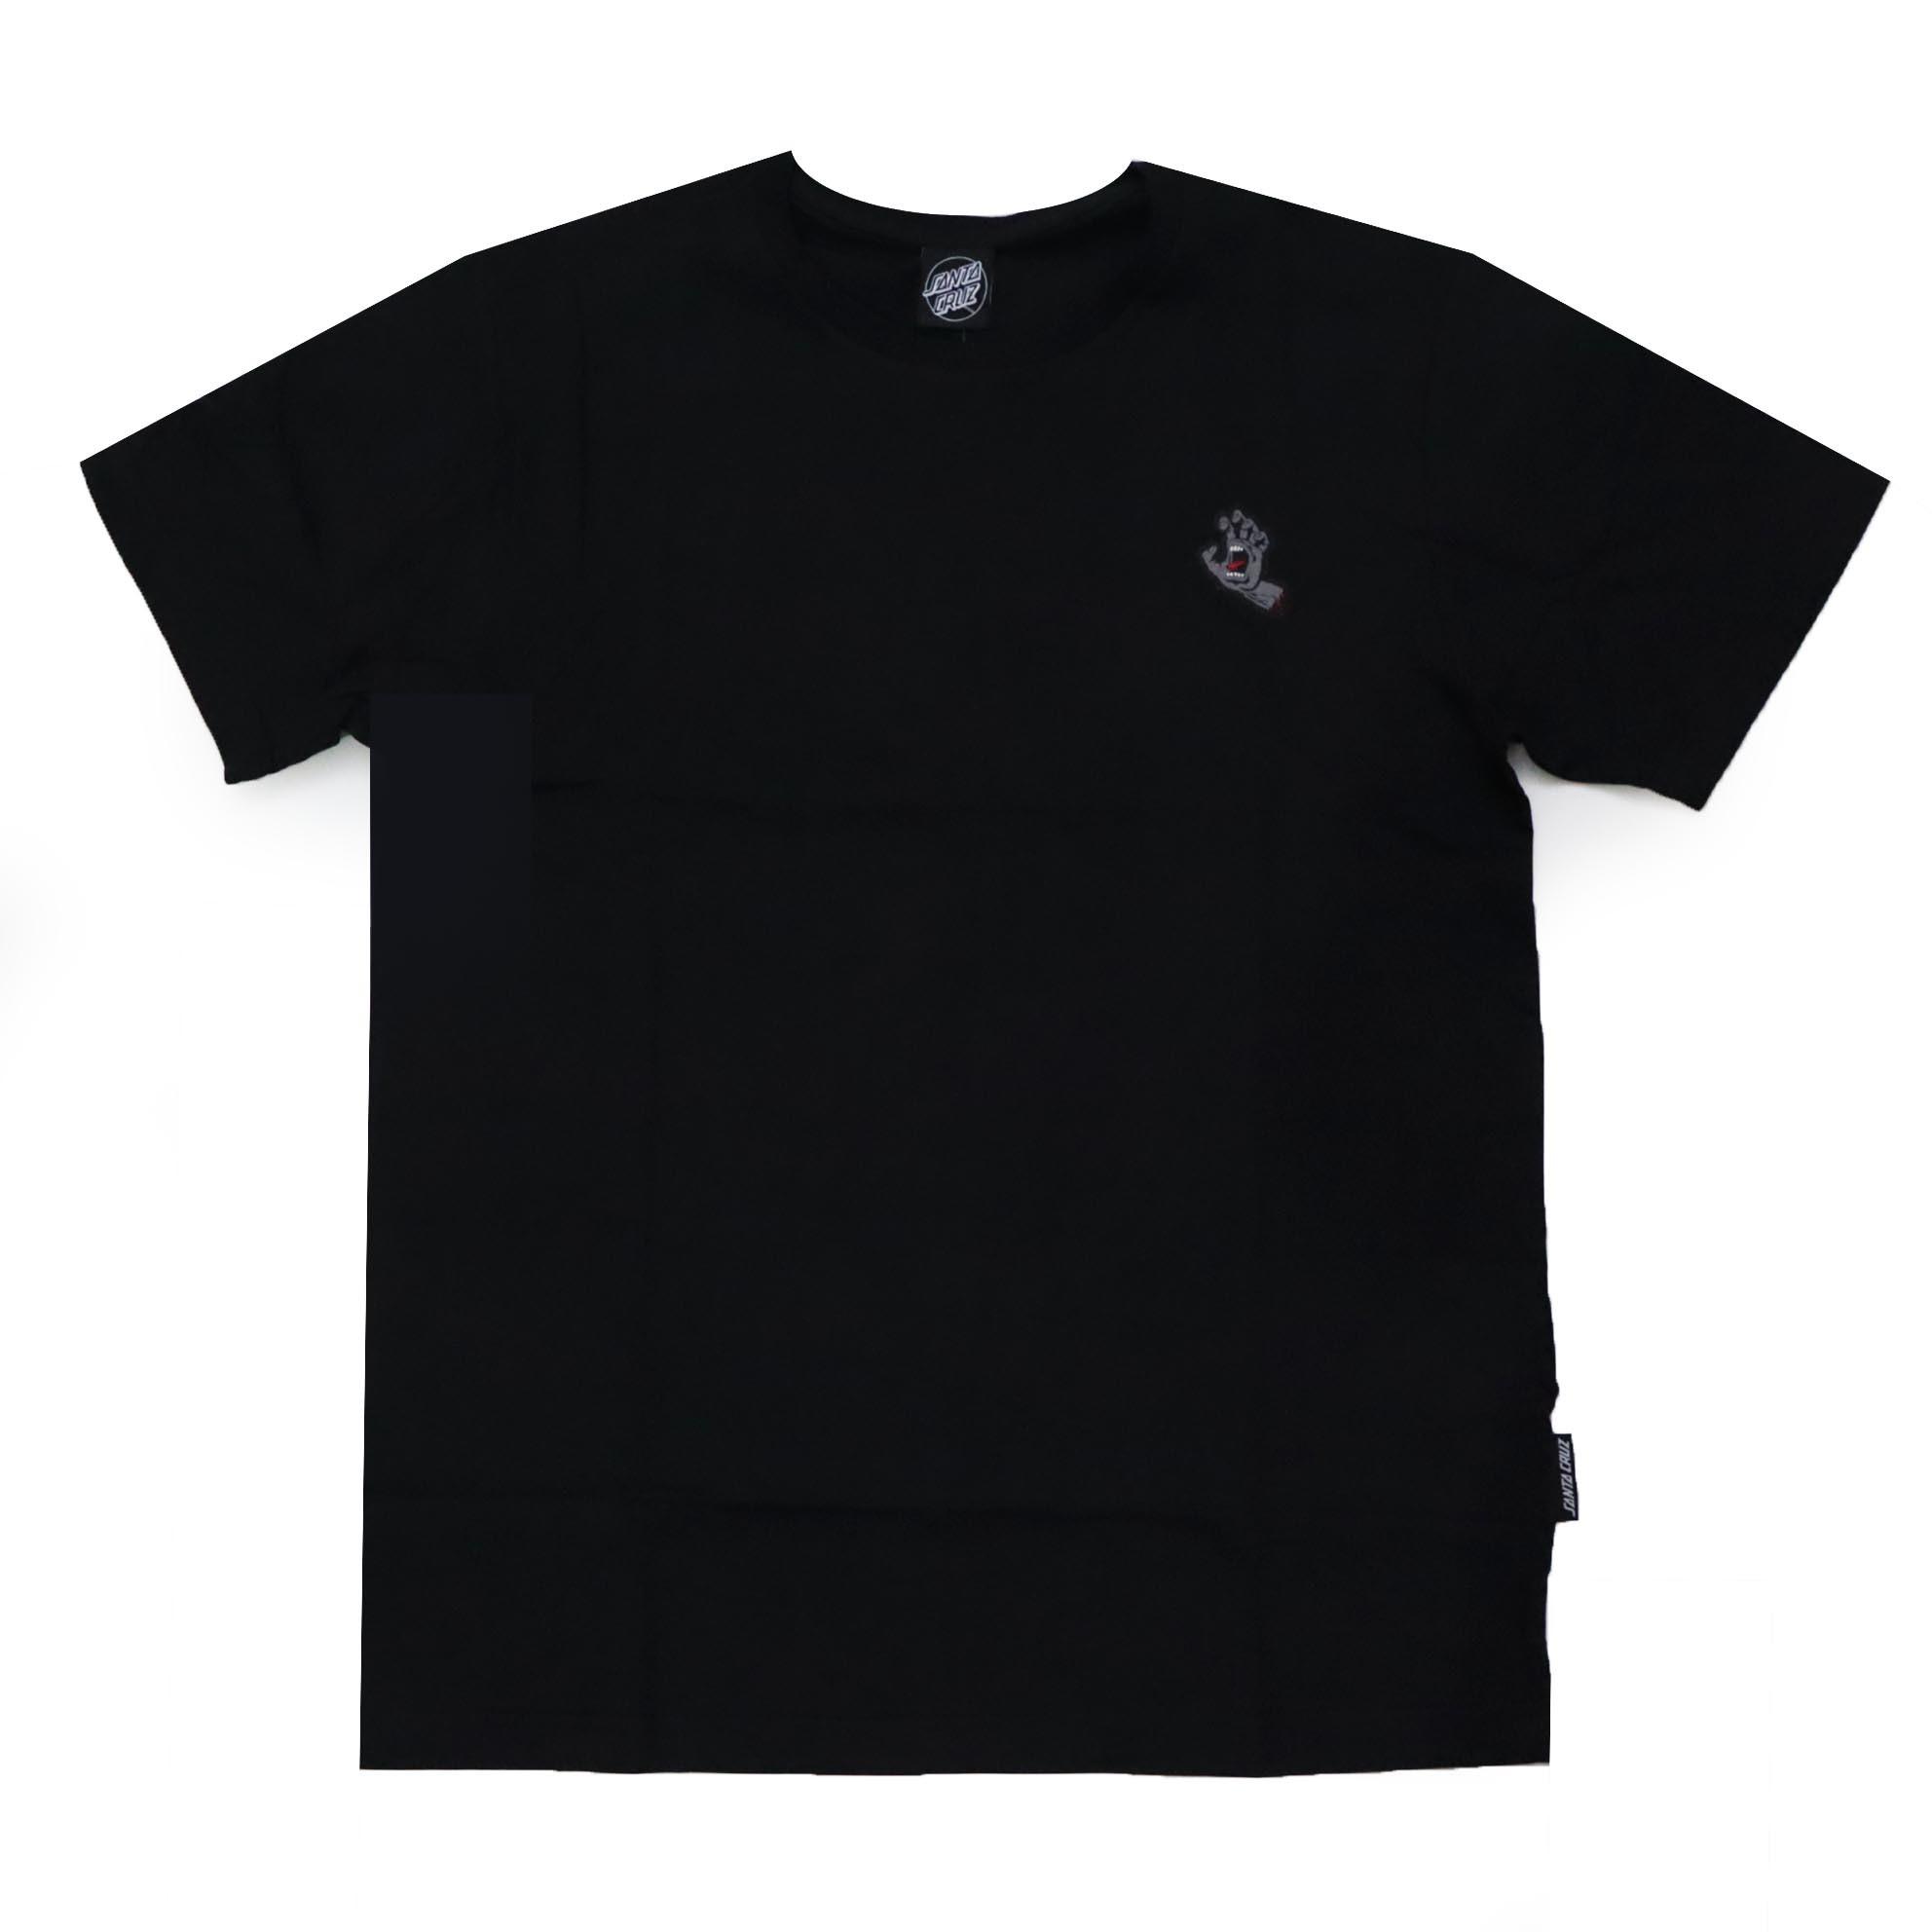 Camiseta Santa Cruz Screaming Hand Chest - Preto